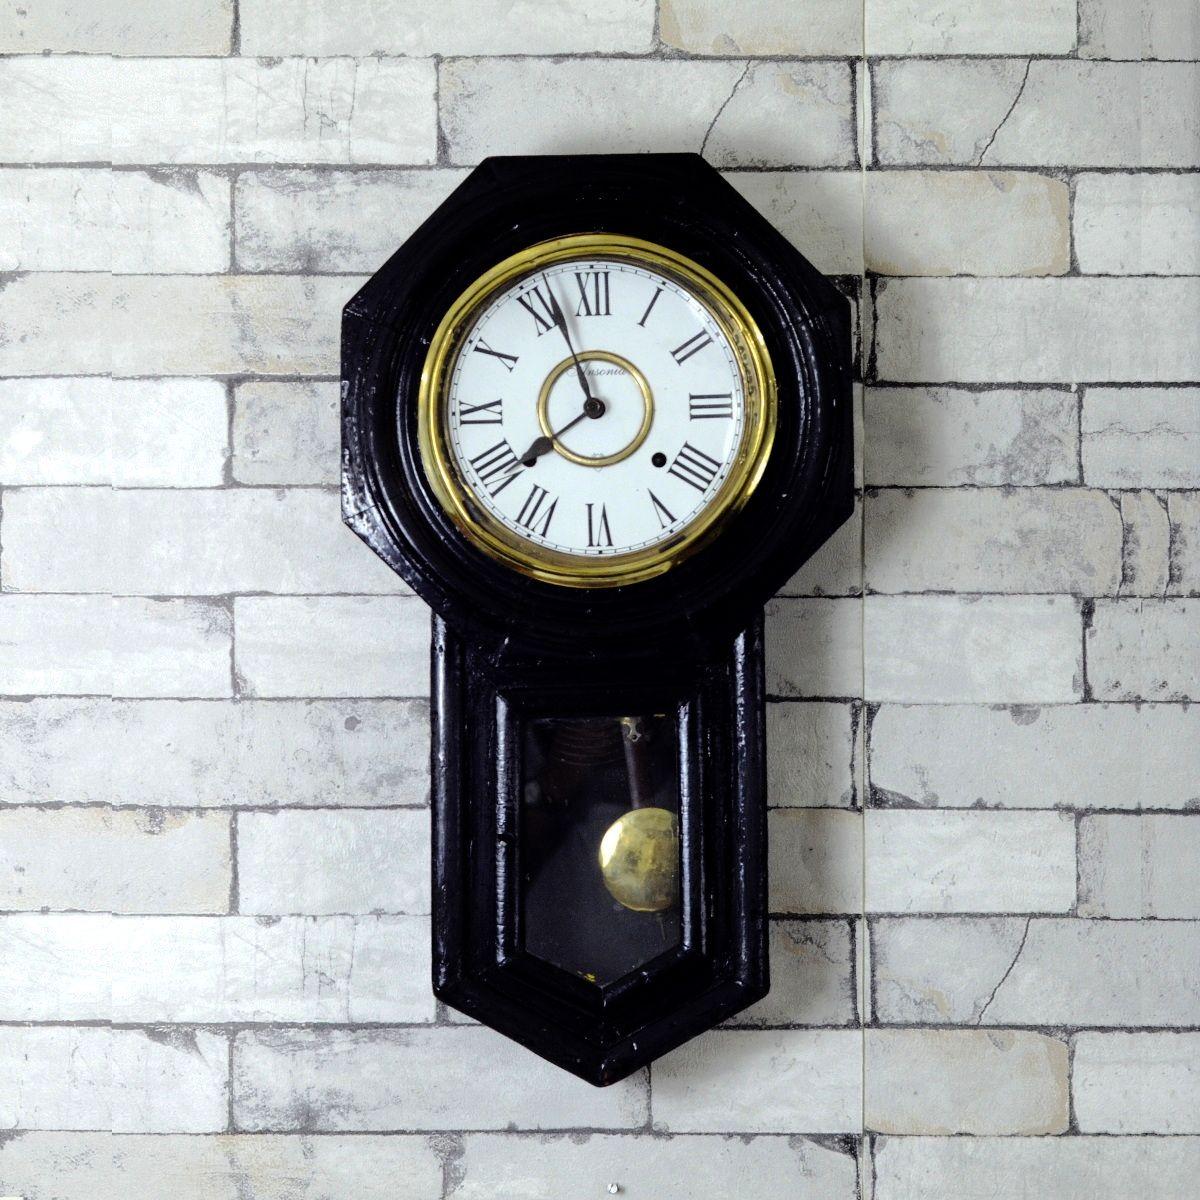 Antique Ansonia Made In Usa Bim Bam Wall Clock Antikcart Wall Clock Clock Antique Clocks